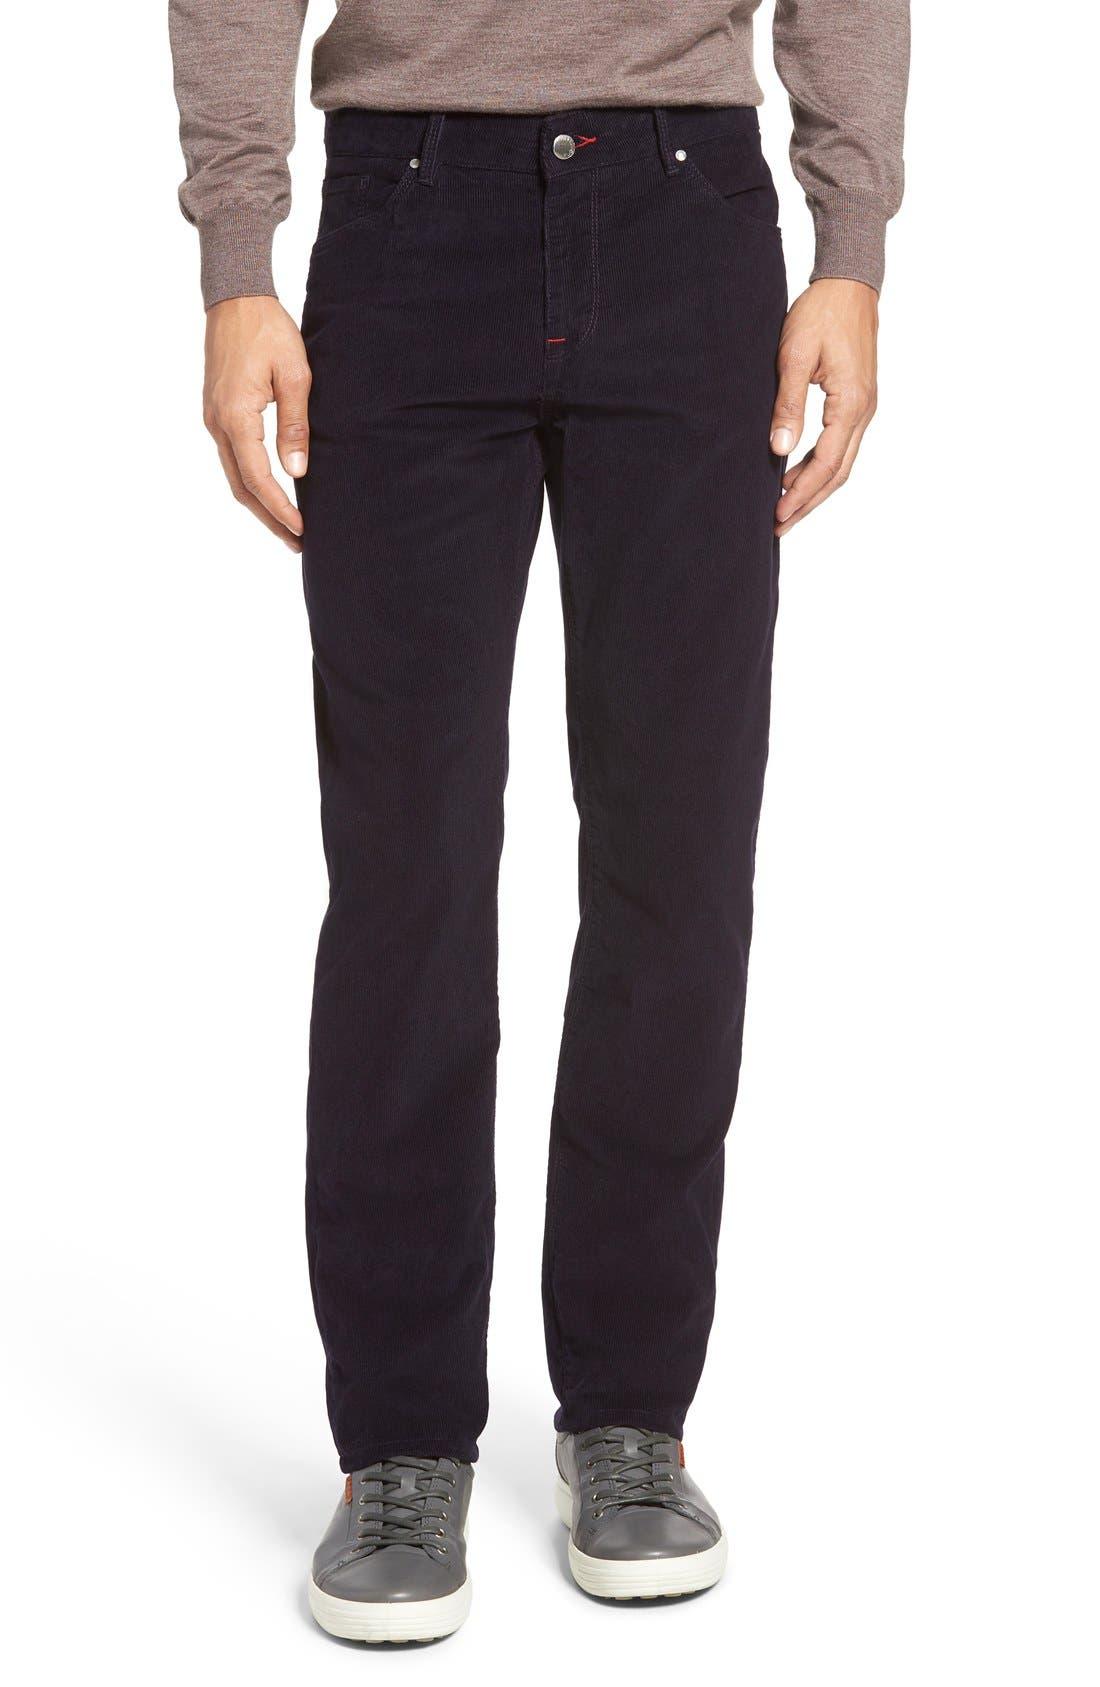 Alternate Image 1 Selected - Bugatchi Slim Fit Corduroy Pants